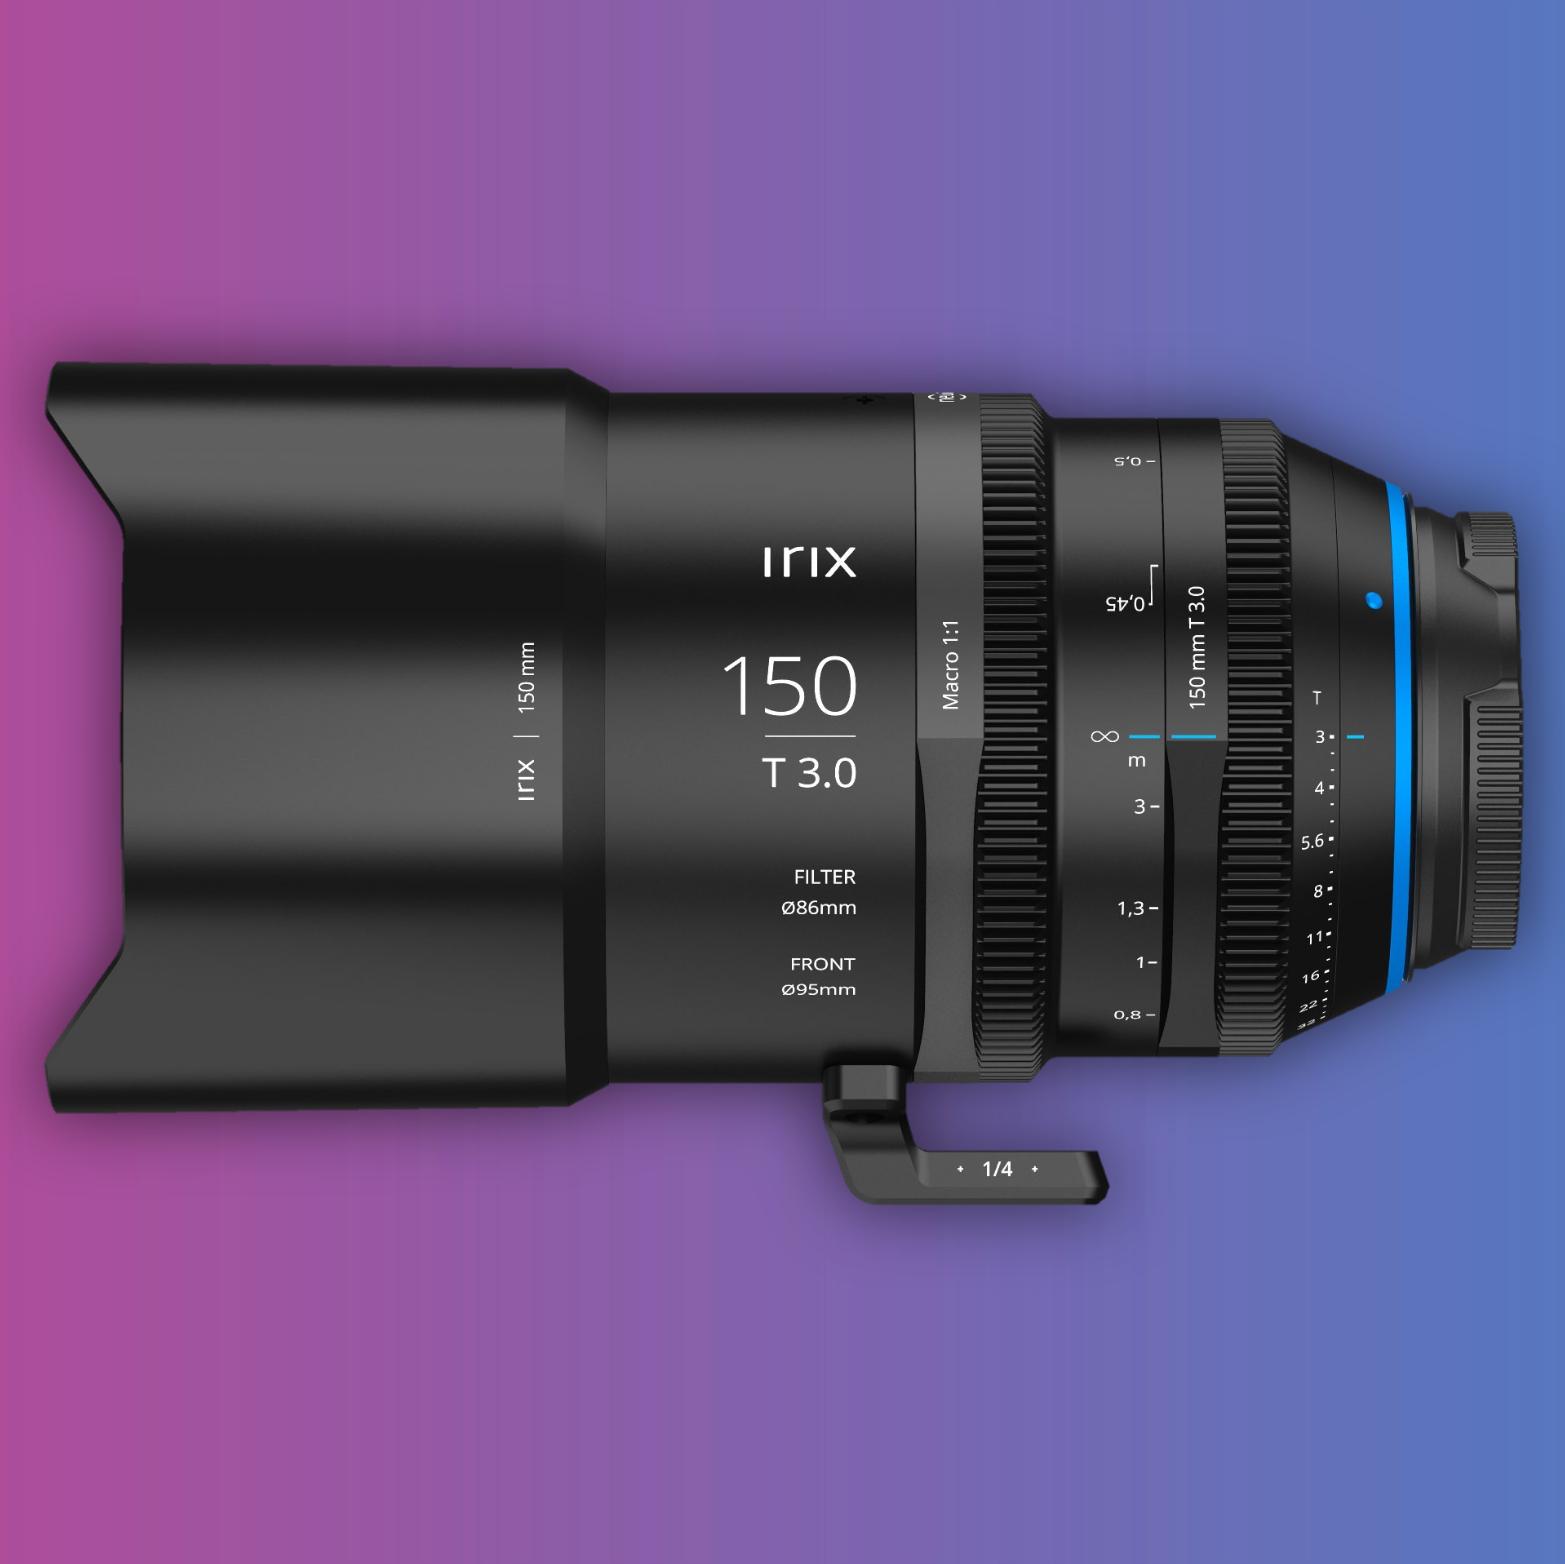 [MFT] Irix Cine Lens 150mm Macro 1:1 T3.0 Filmobjektiv